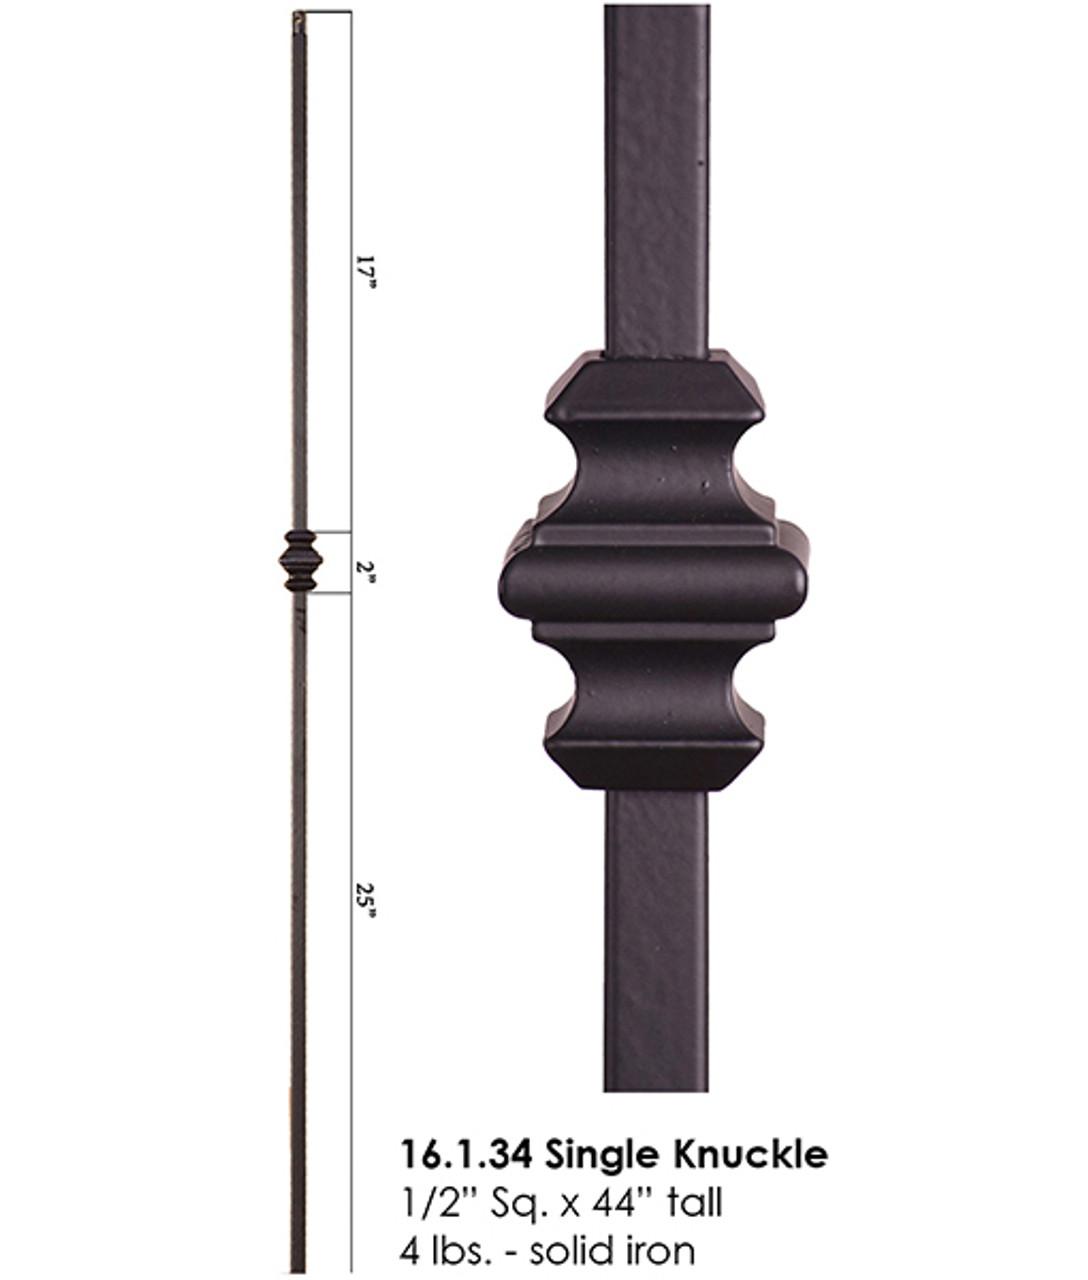 HF16.1.34 Single Knuckle Iron Baluster